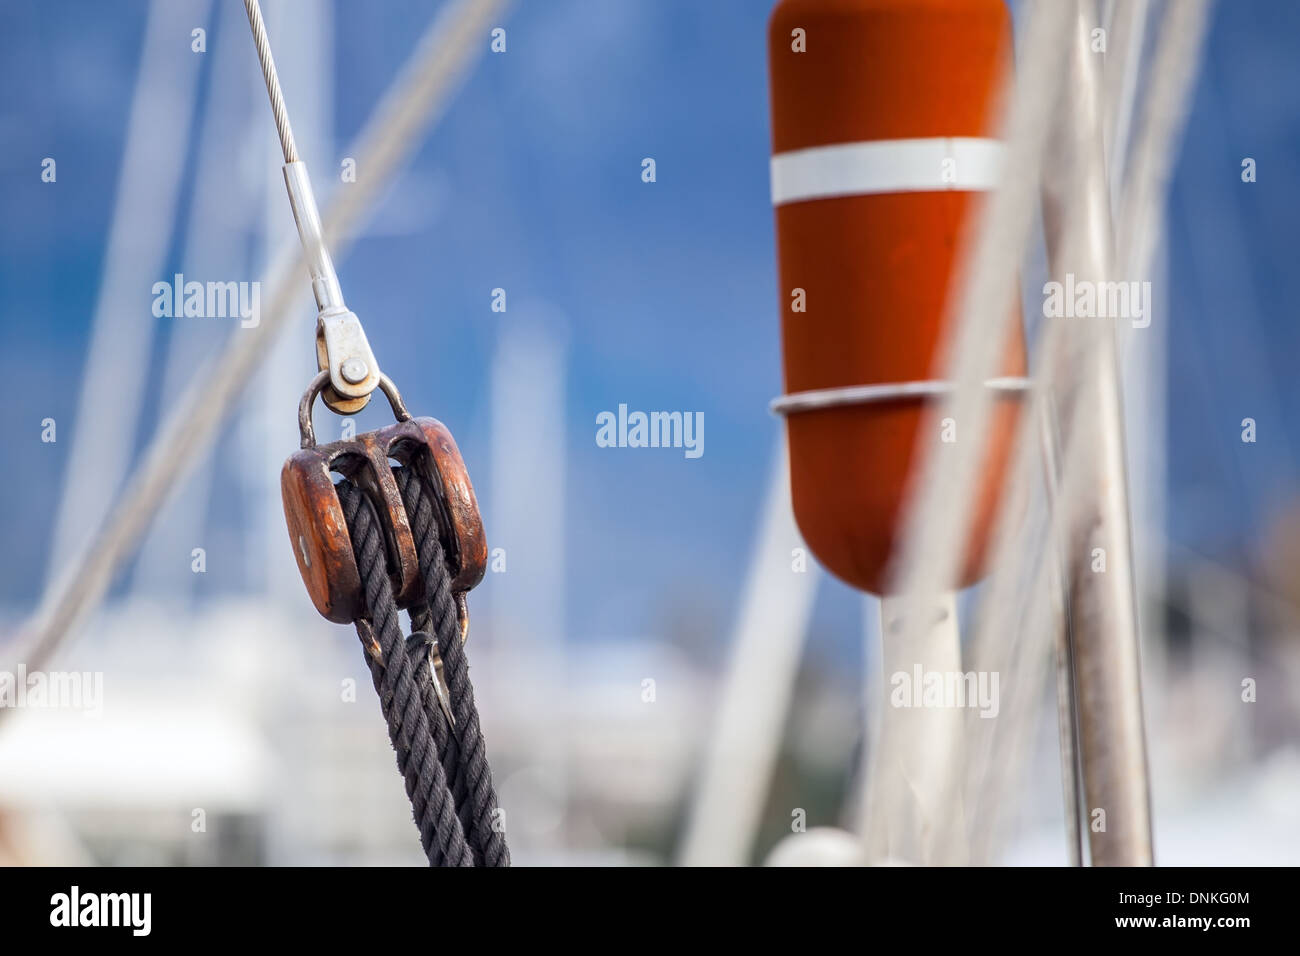 Running rigging gear ship tackles - Stock Image